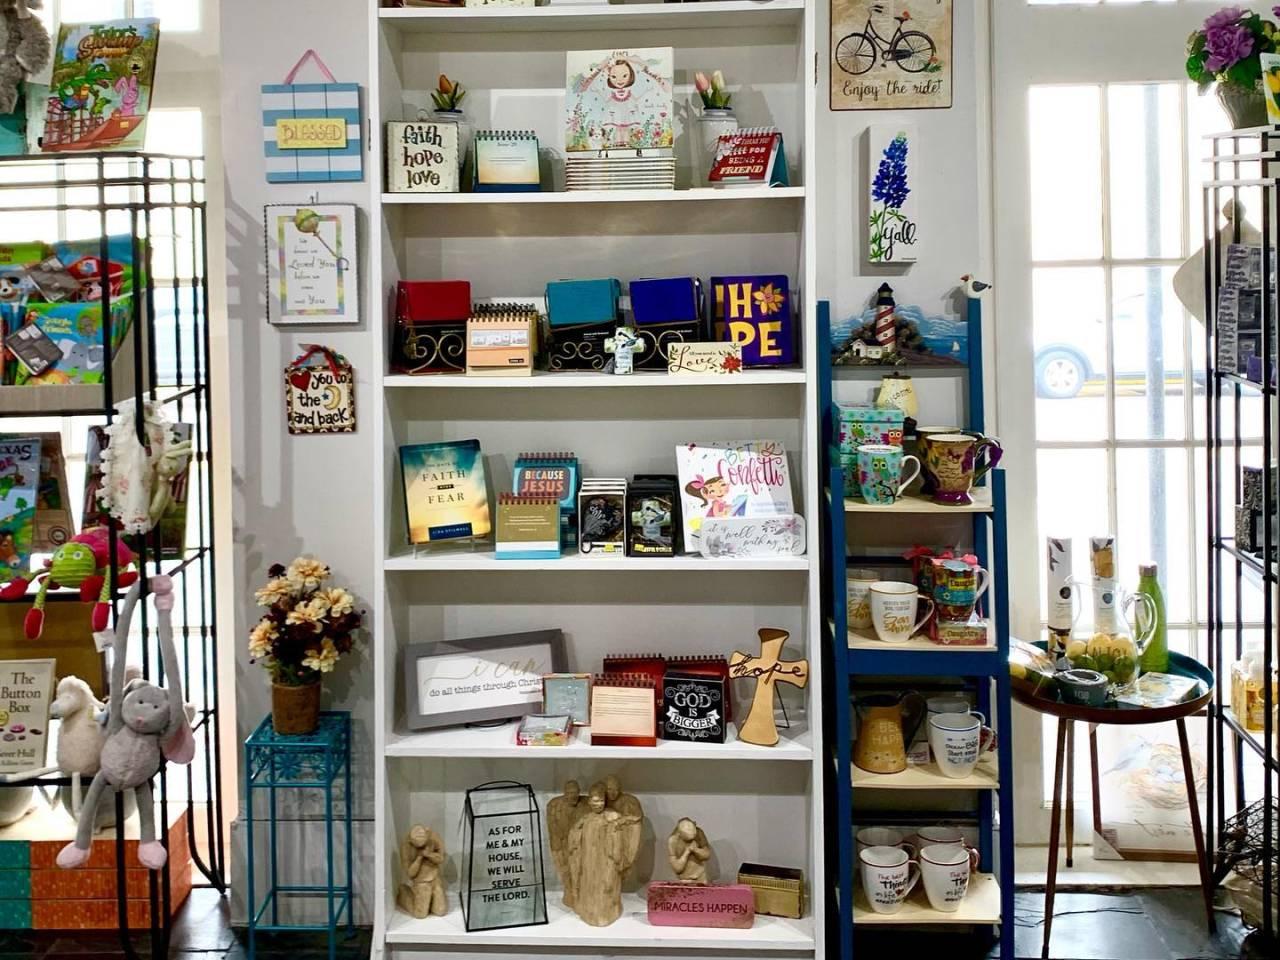 Amy Lane Gifts & Simple Pleasures